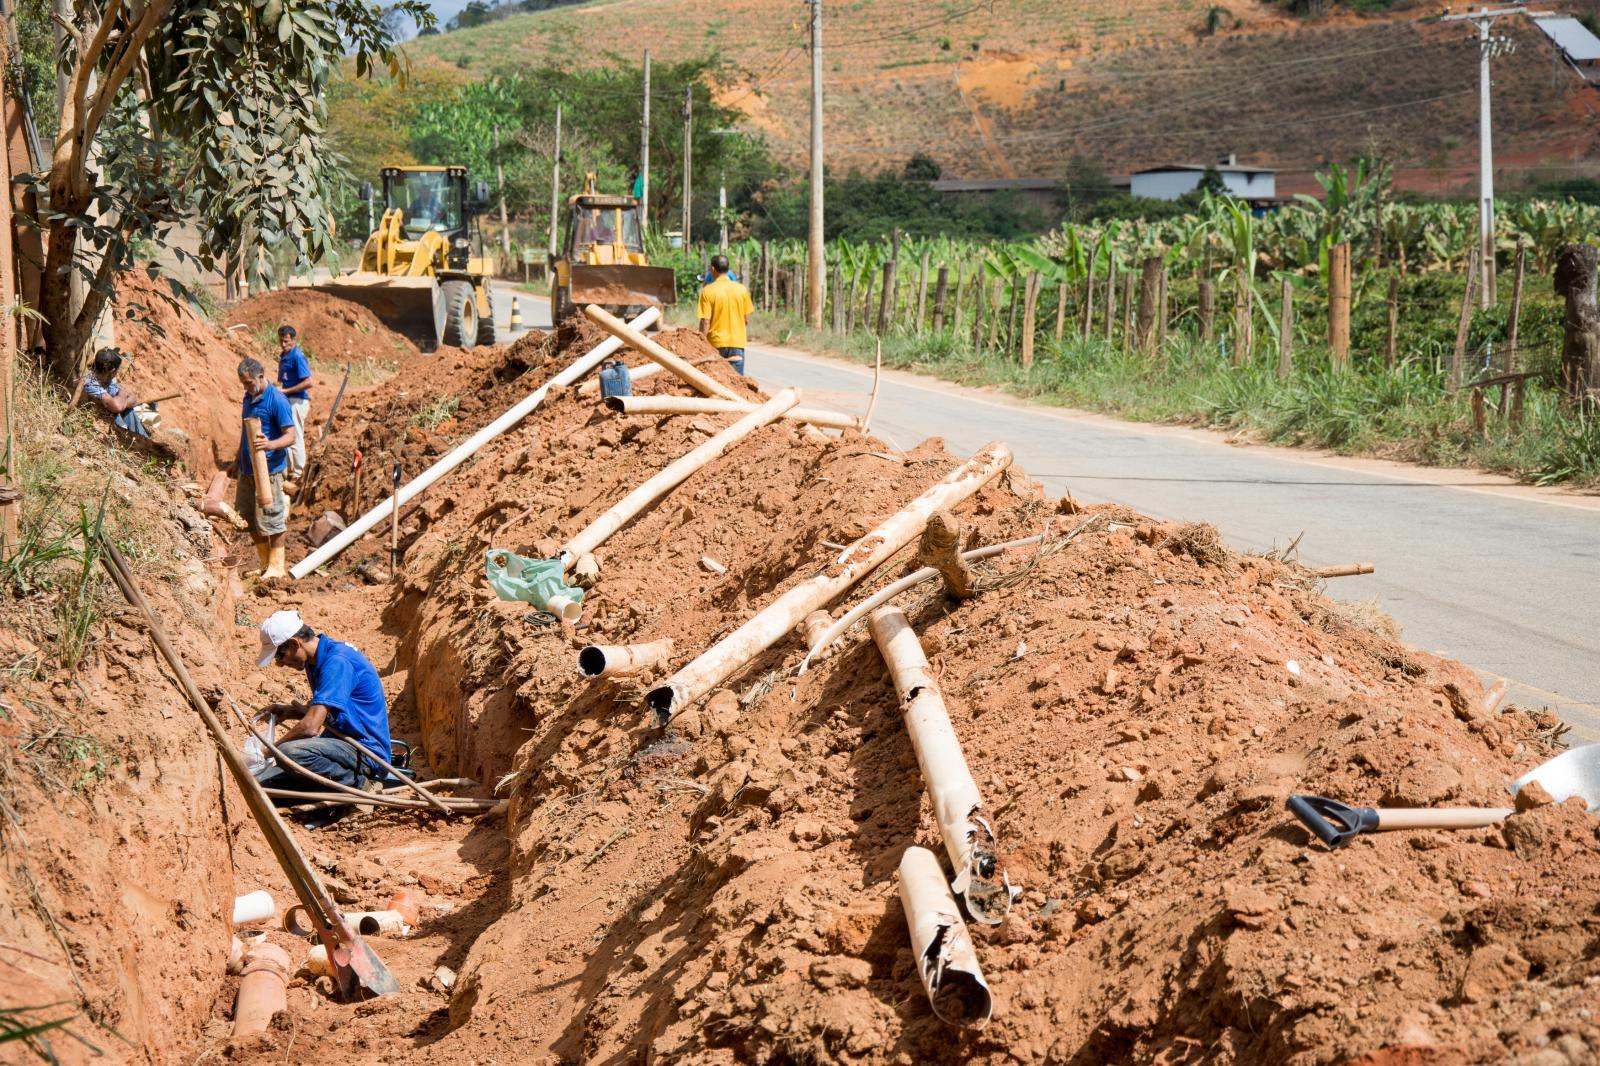 SAAE está refazendo a rede de esgoto na comunidade dos Coan